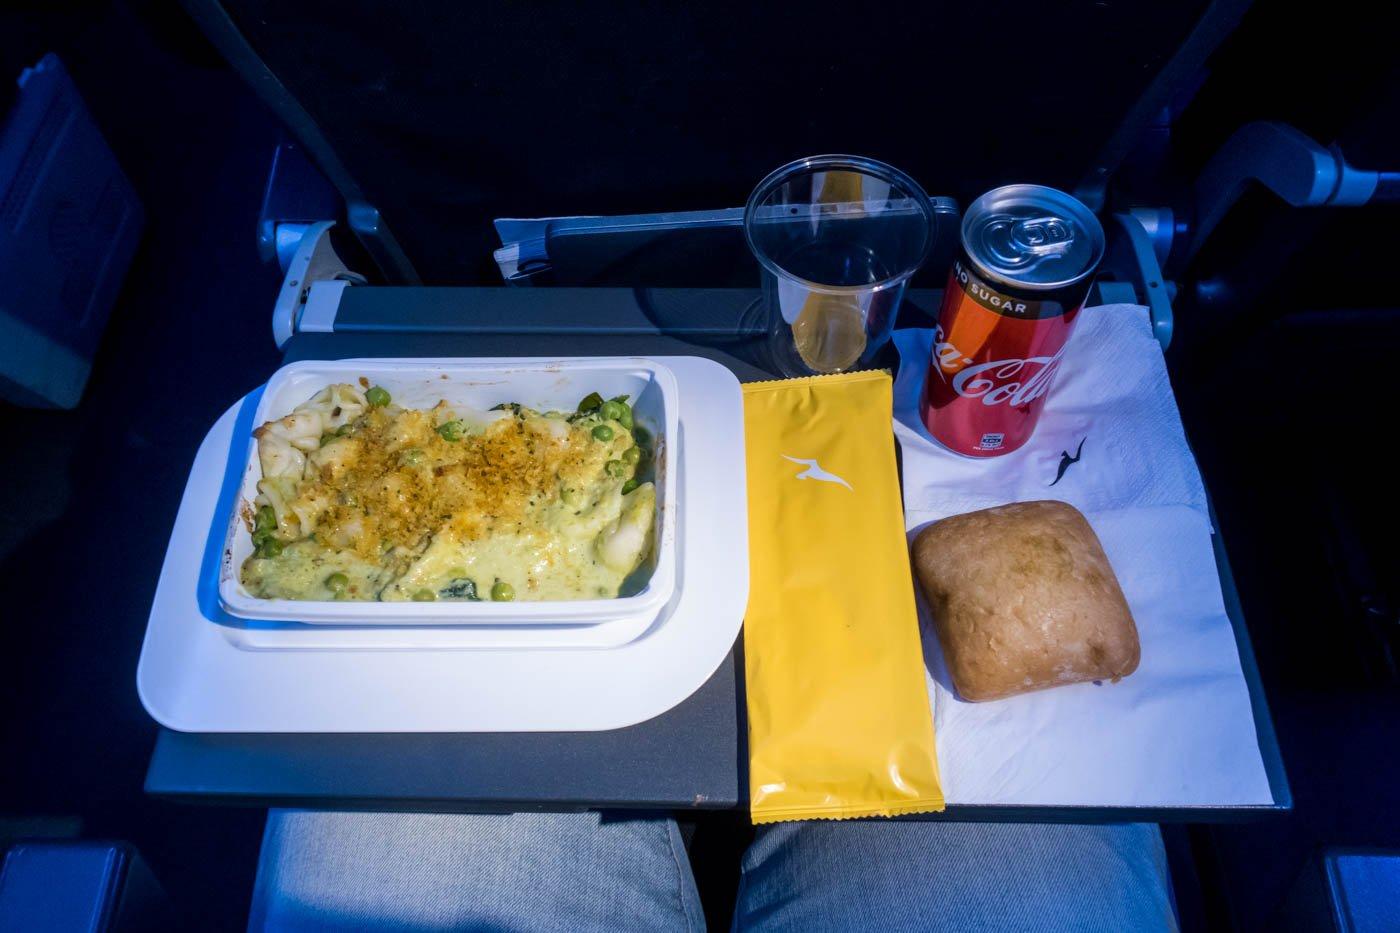 Qantas Trans-Tasman Meal